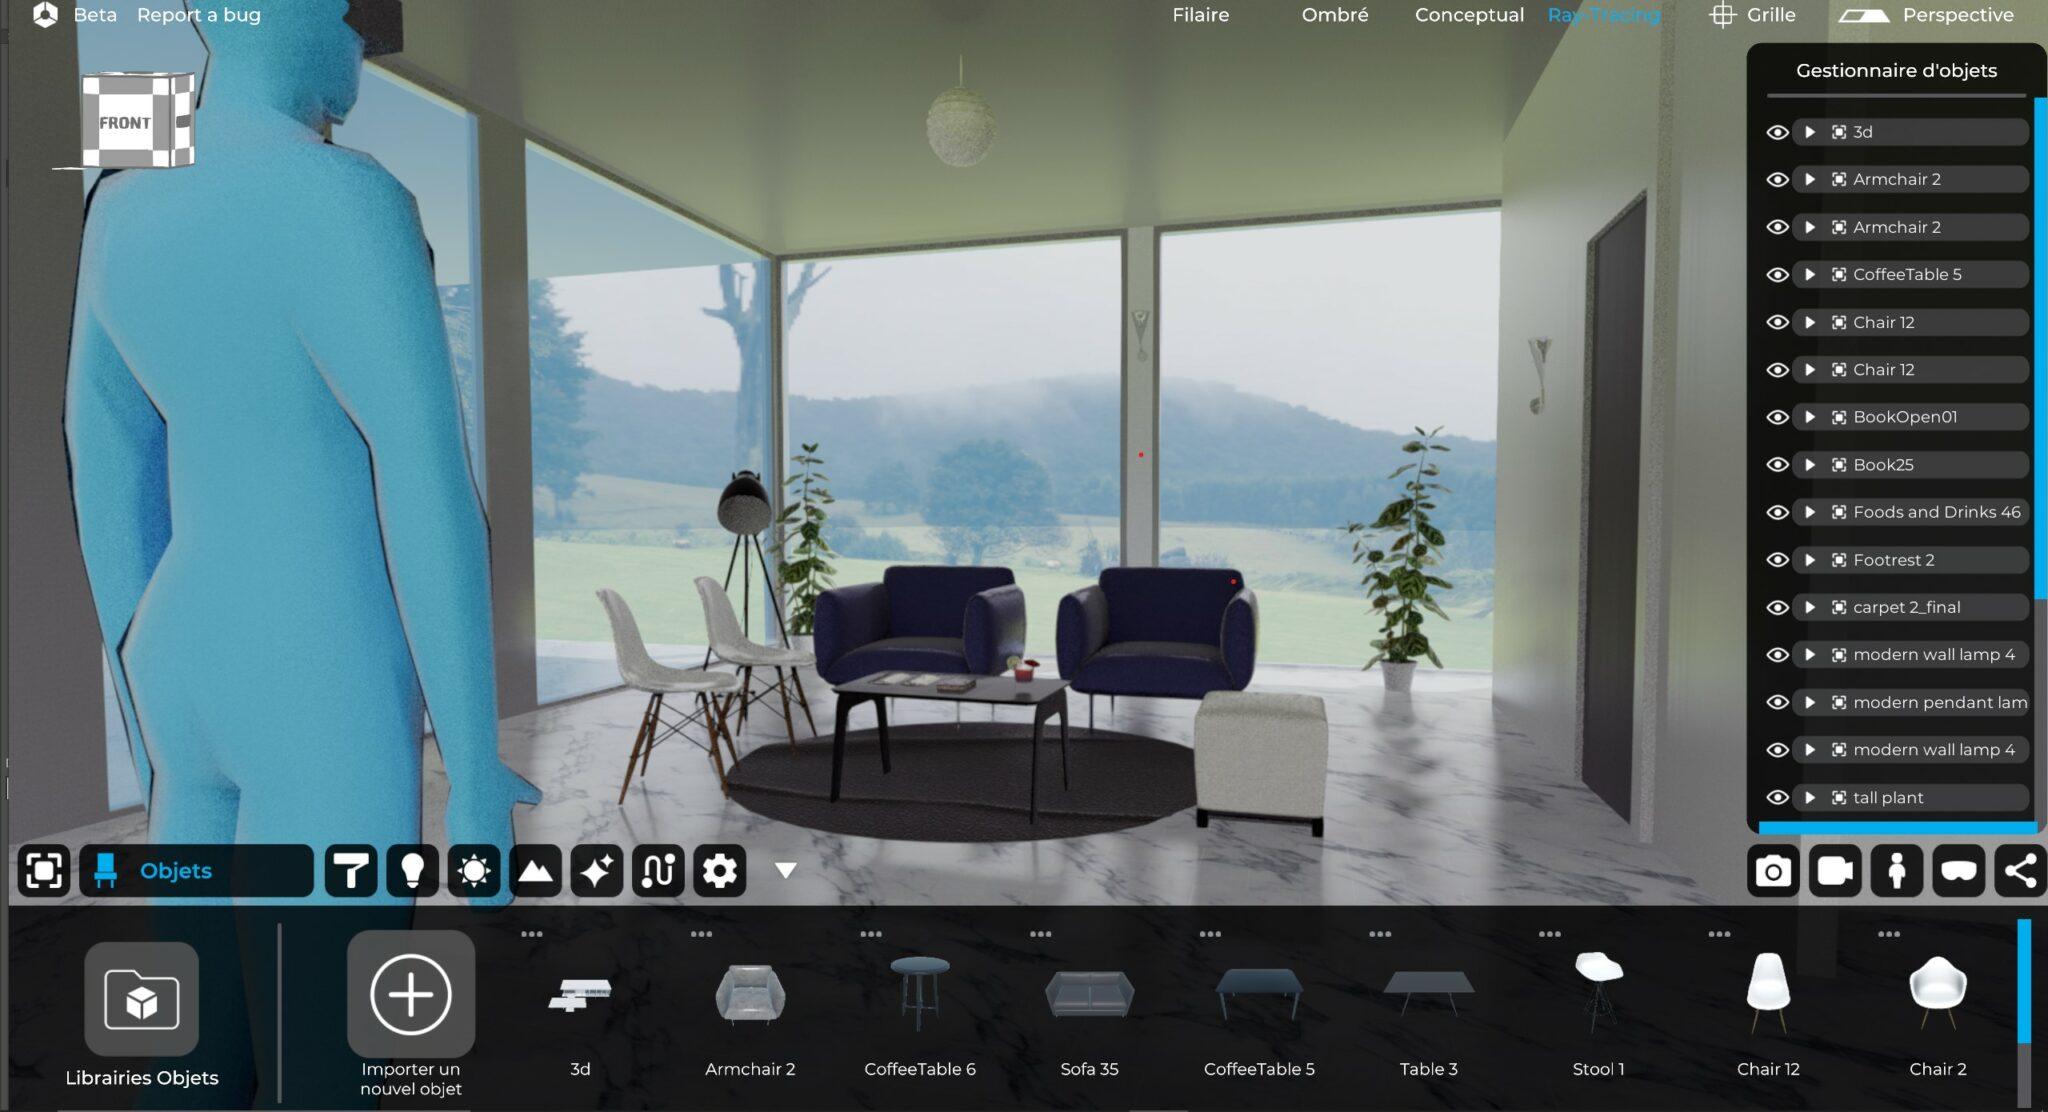 eyecad vr interface